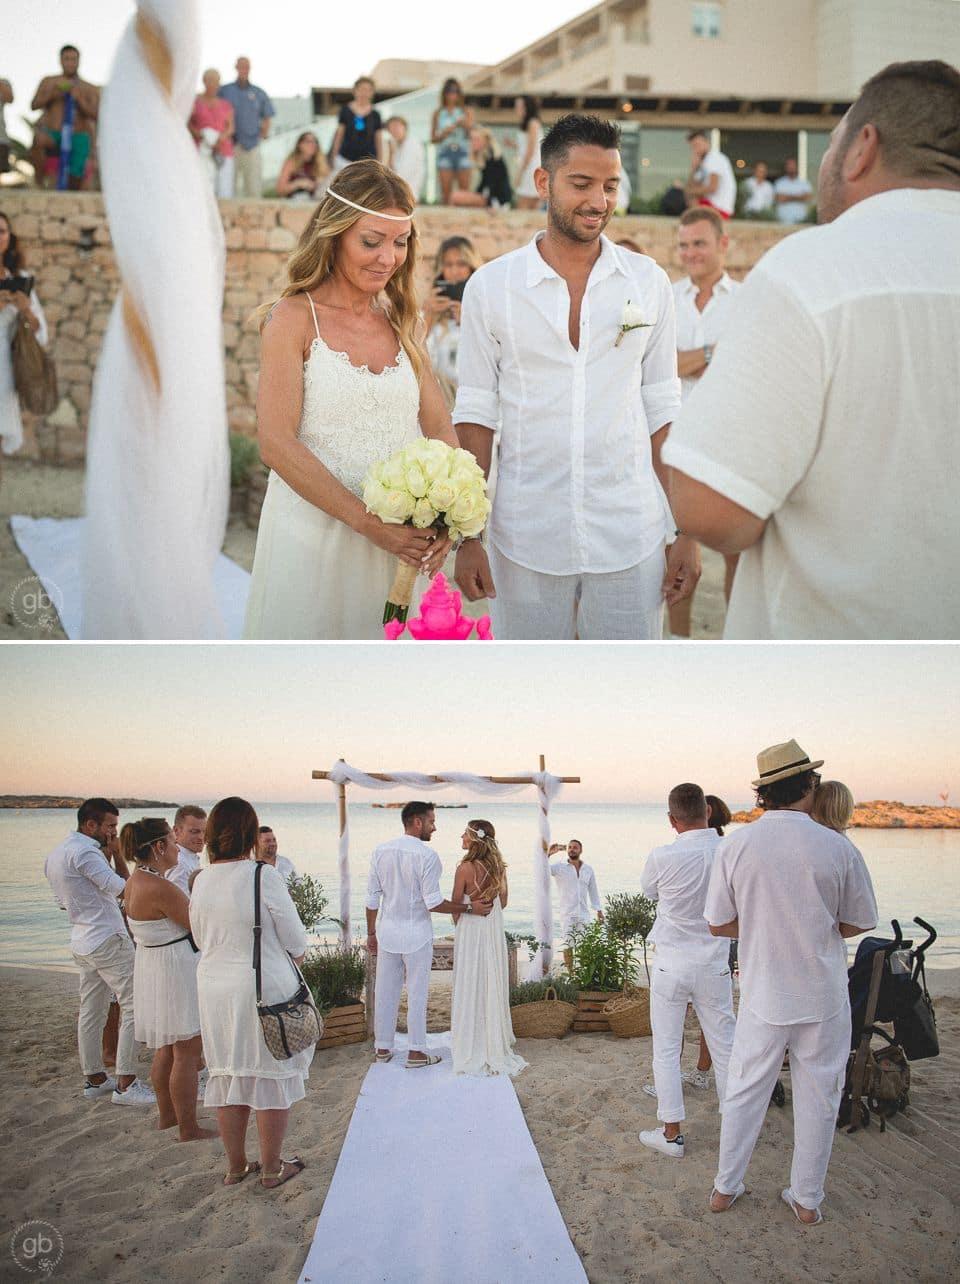 Matrimonio Spiaggia Fuerteventura : Matrimonio in spiaggia a formentera